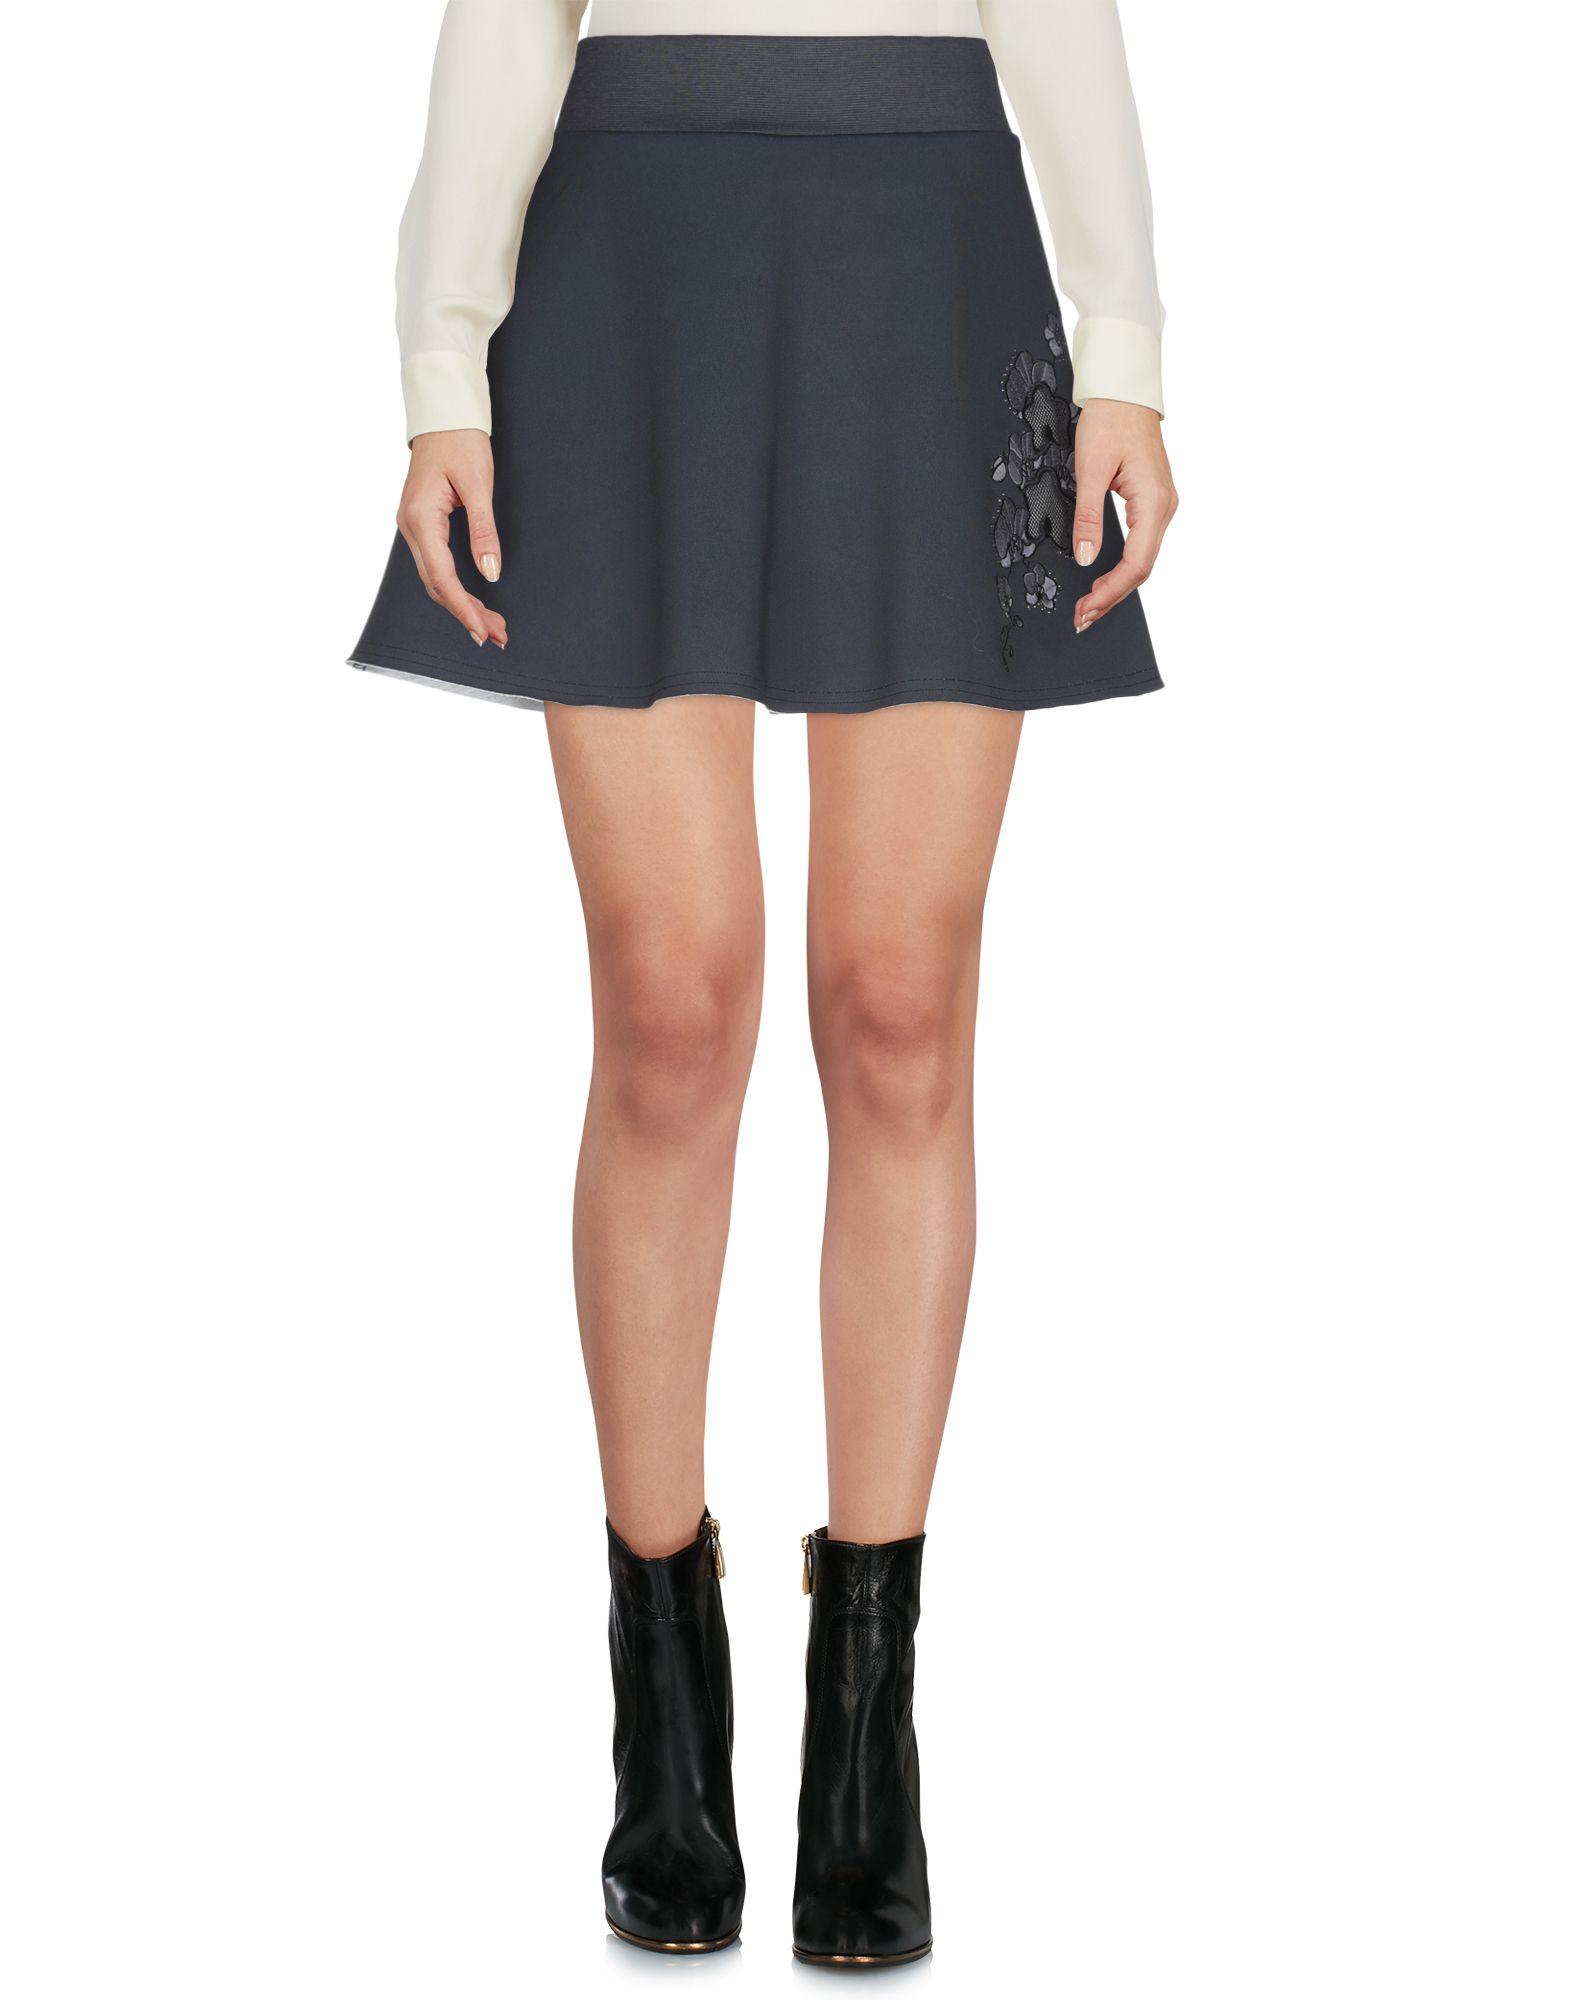 LIU •JO SPORT Мини-юбка sport dress katrus платья и сарафаны мини короткие